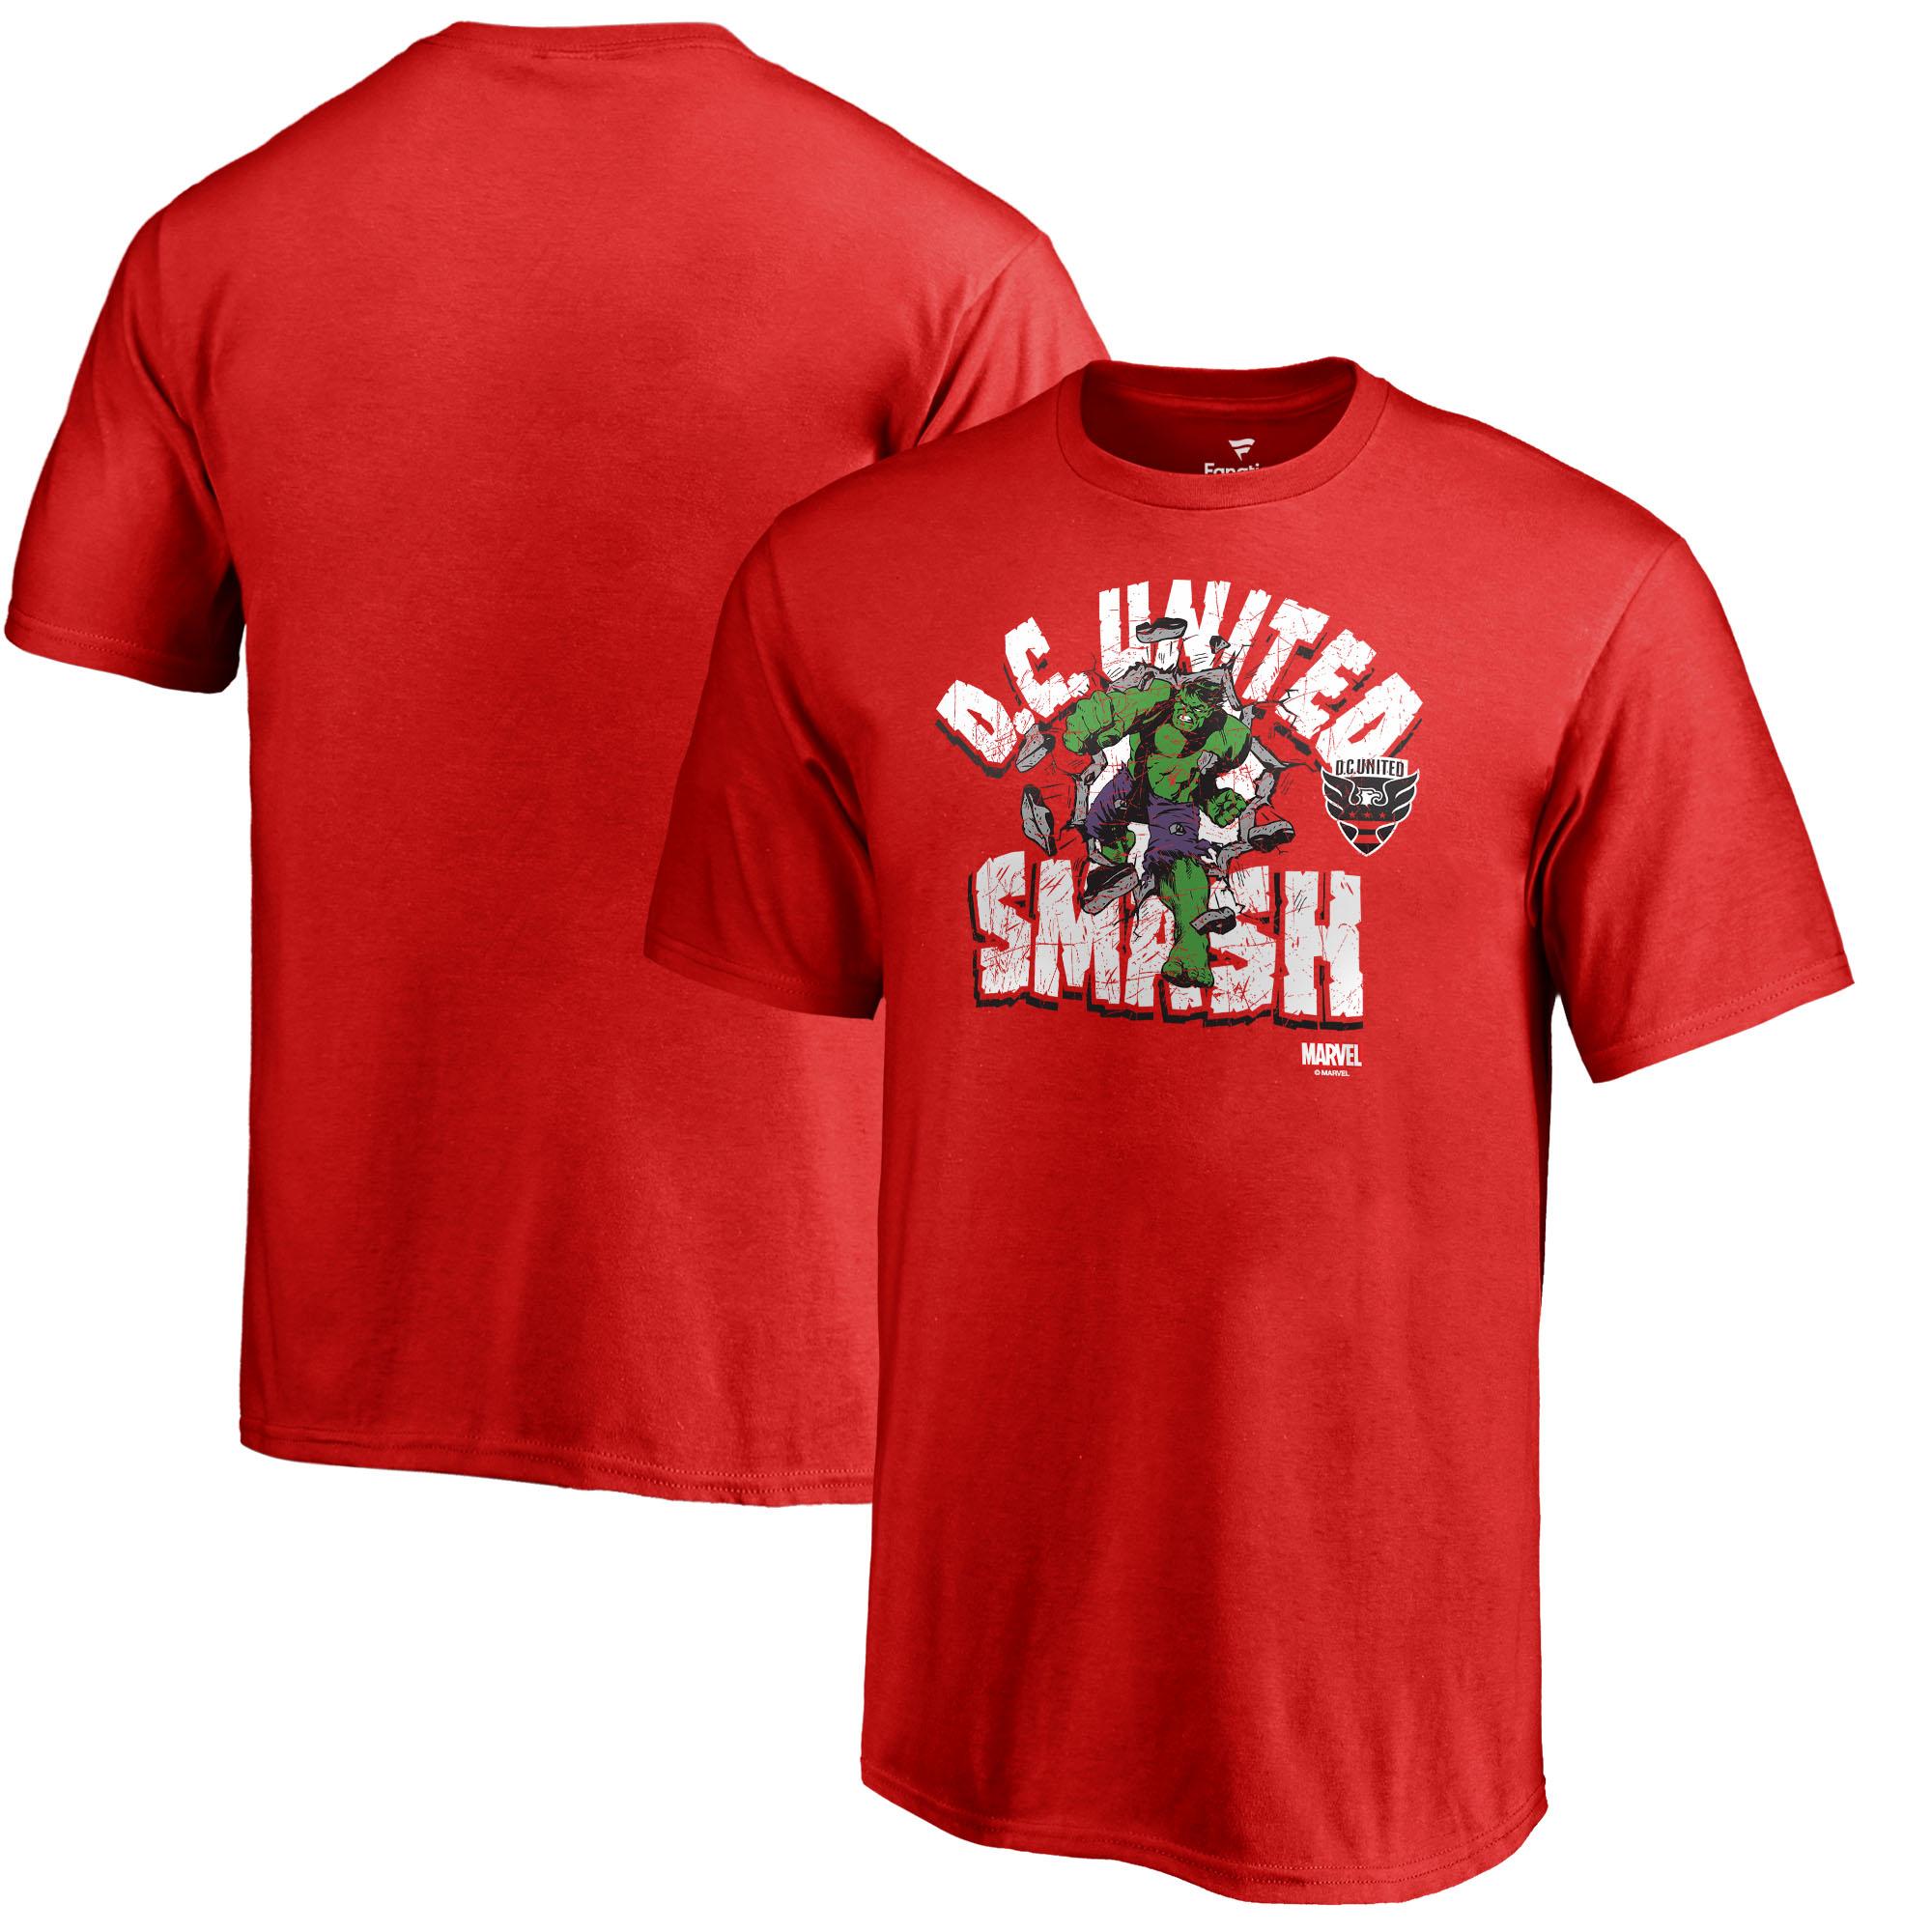 D.C. United Fanatics Branded Youth MLS Marvel Hulk Smash T-Shirt - Red